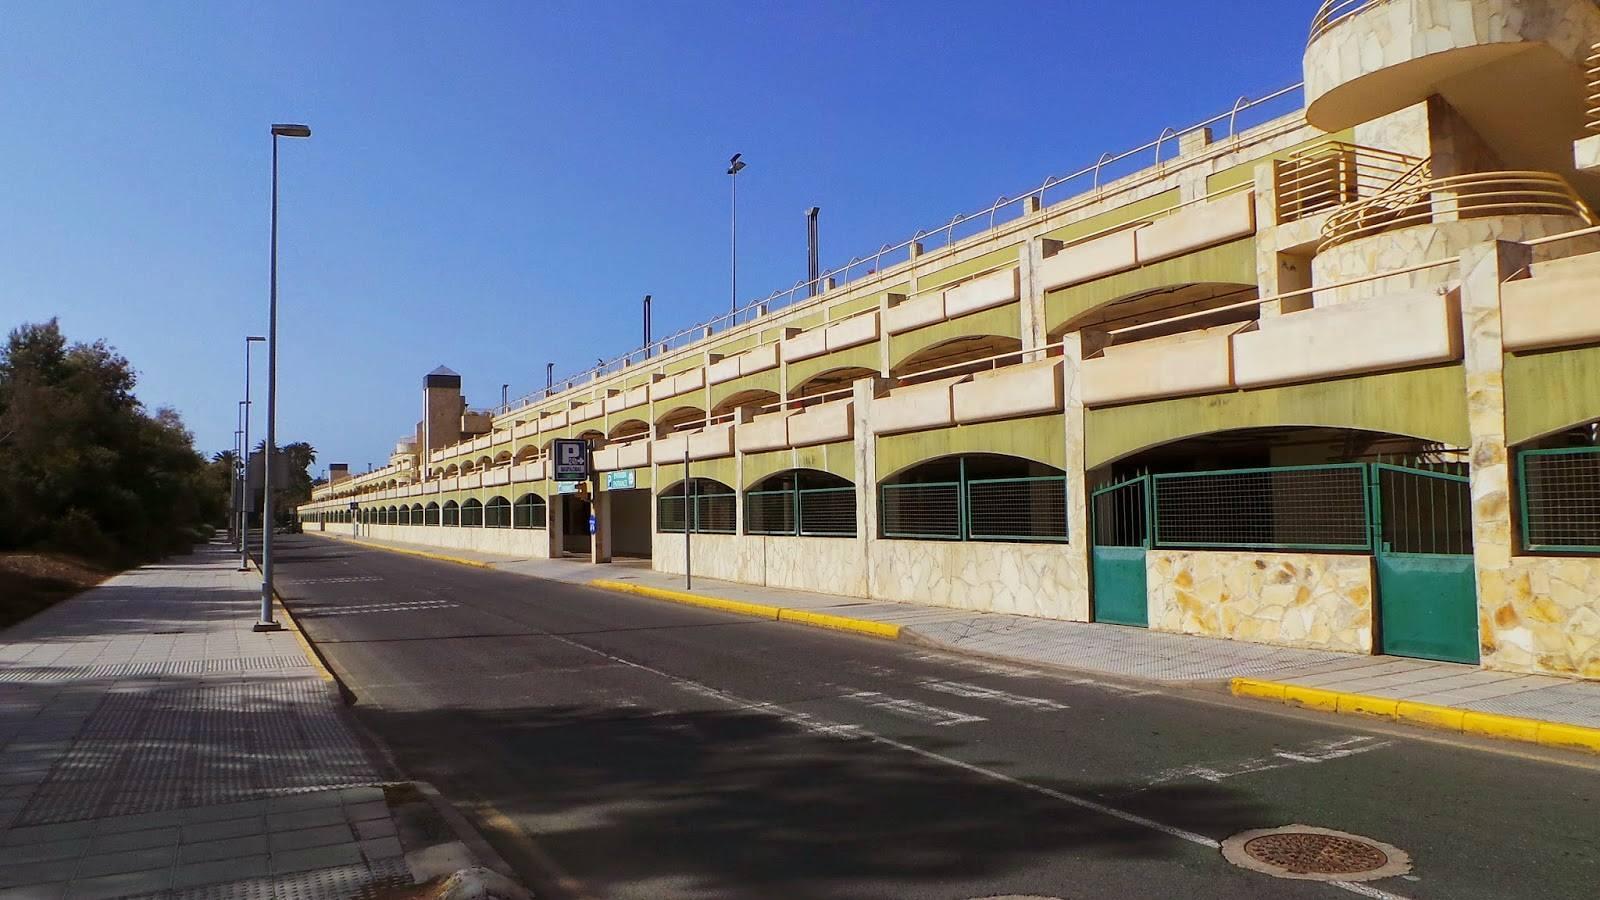 playa maspalomas donde aparcar